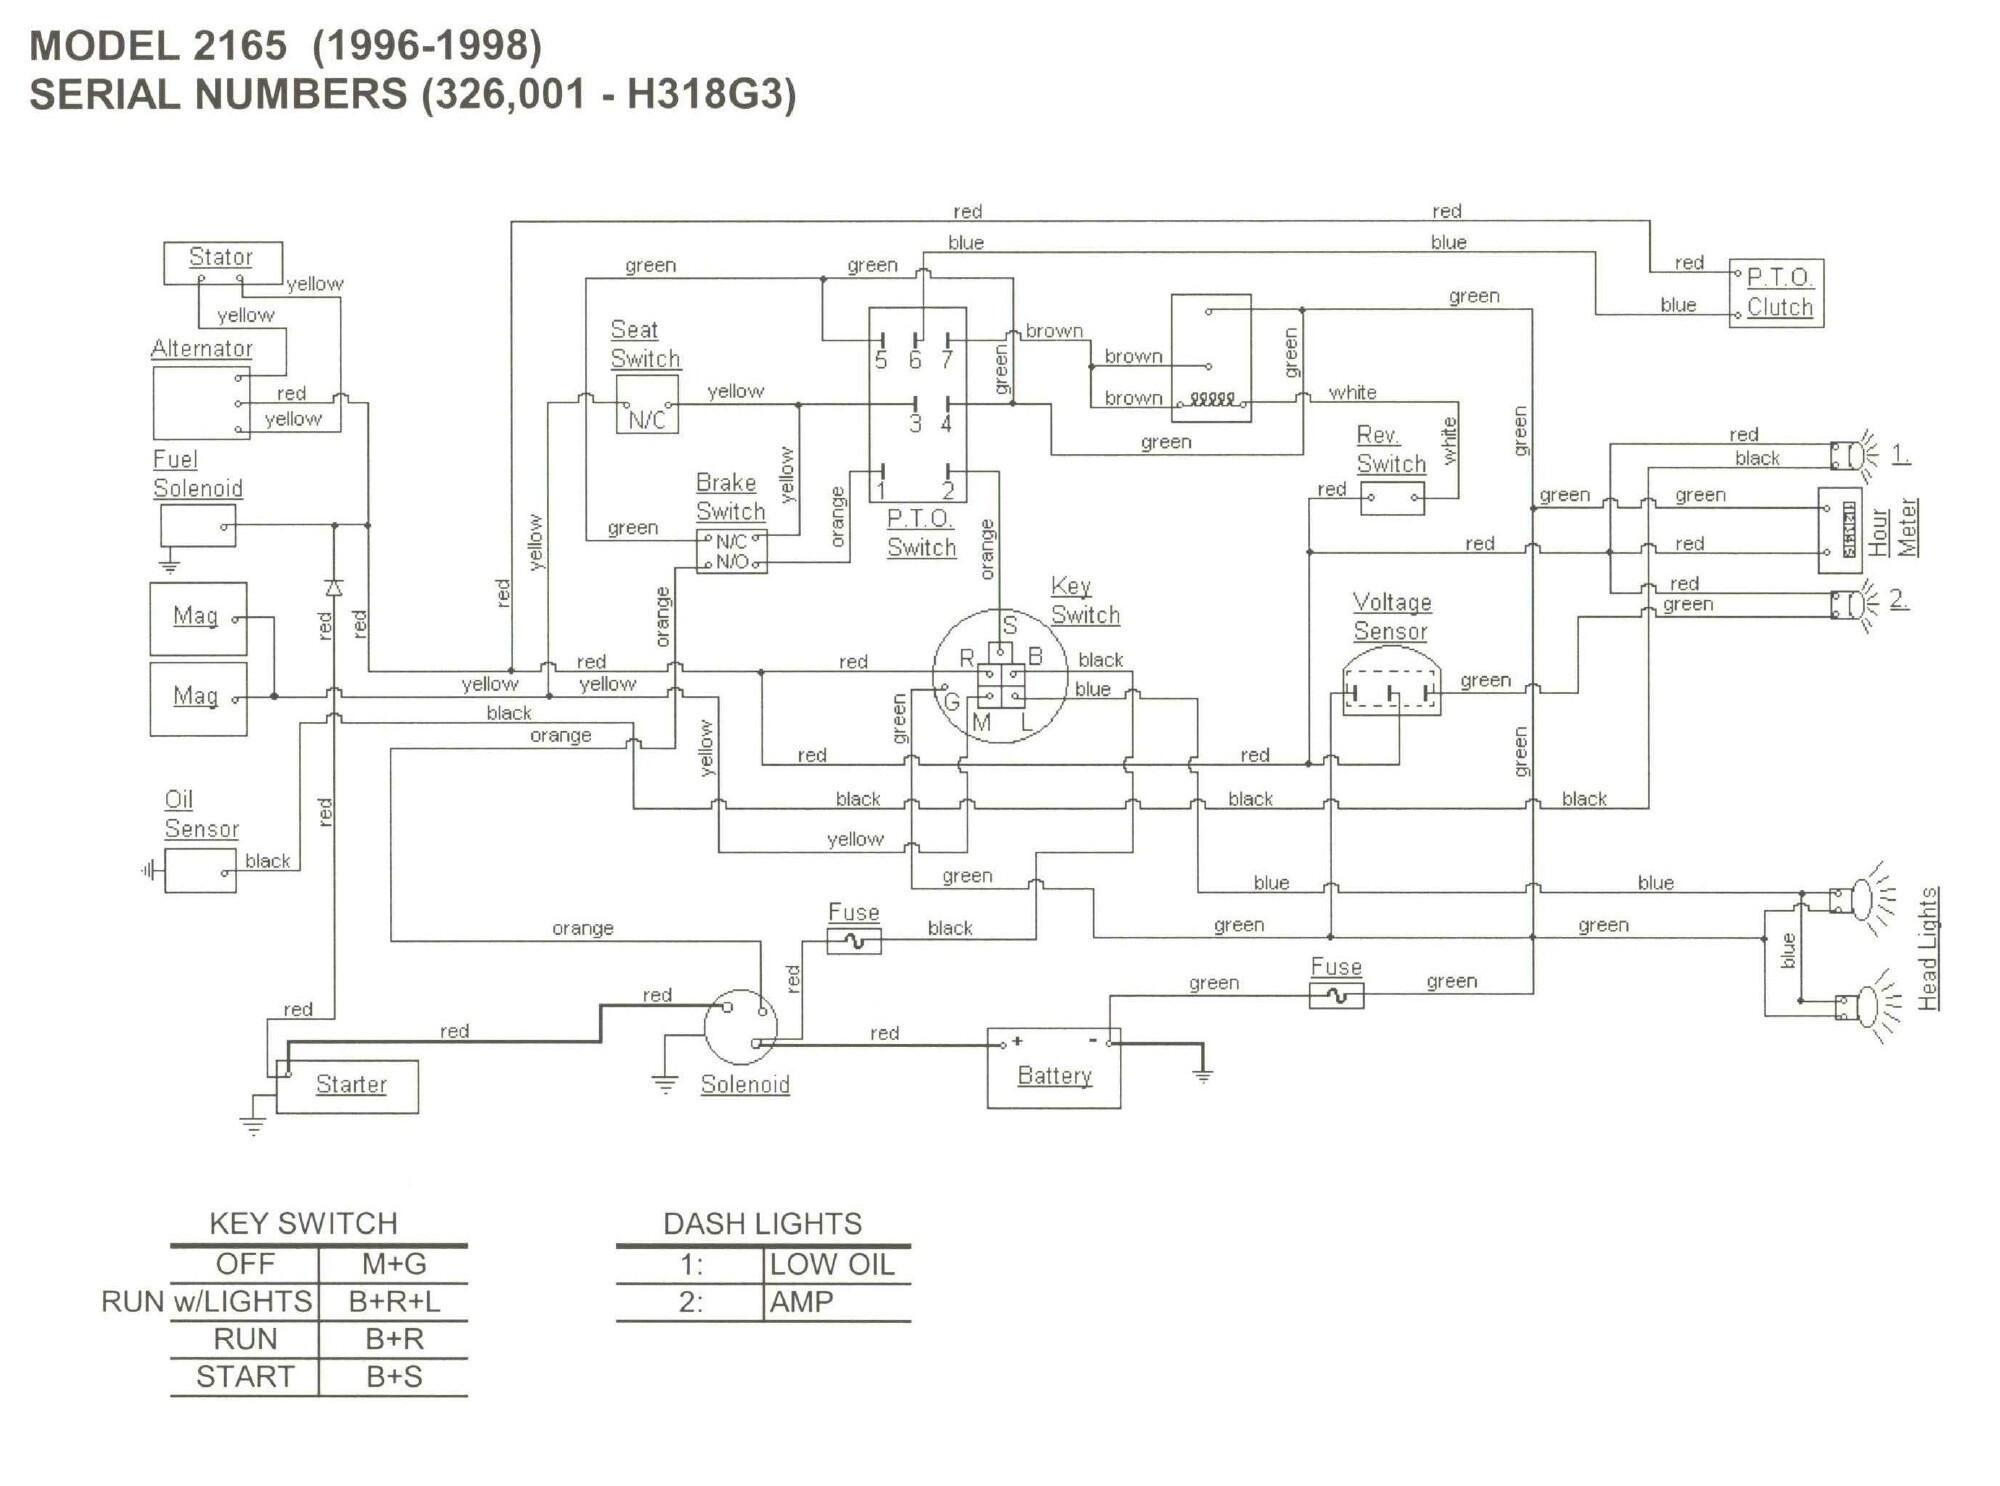 rzt cub cadet wiring diagram cub cadet 1641 wiring diagram wiring diagram data cub cadet rzt l wiring diagram cub cadet 1641 wiring diagram wiring